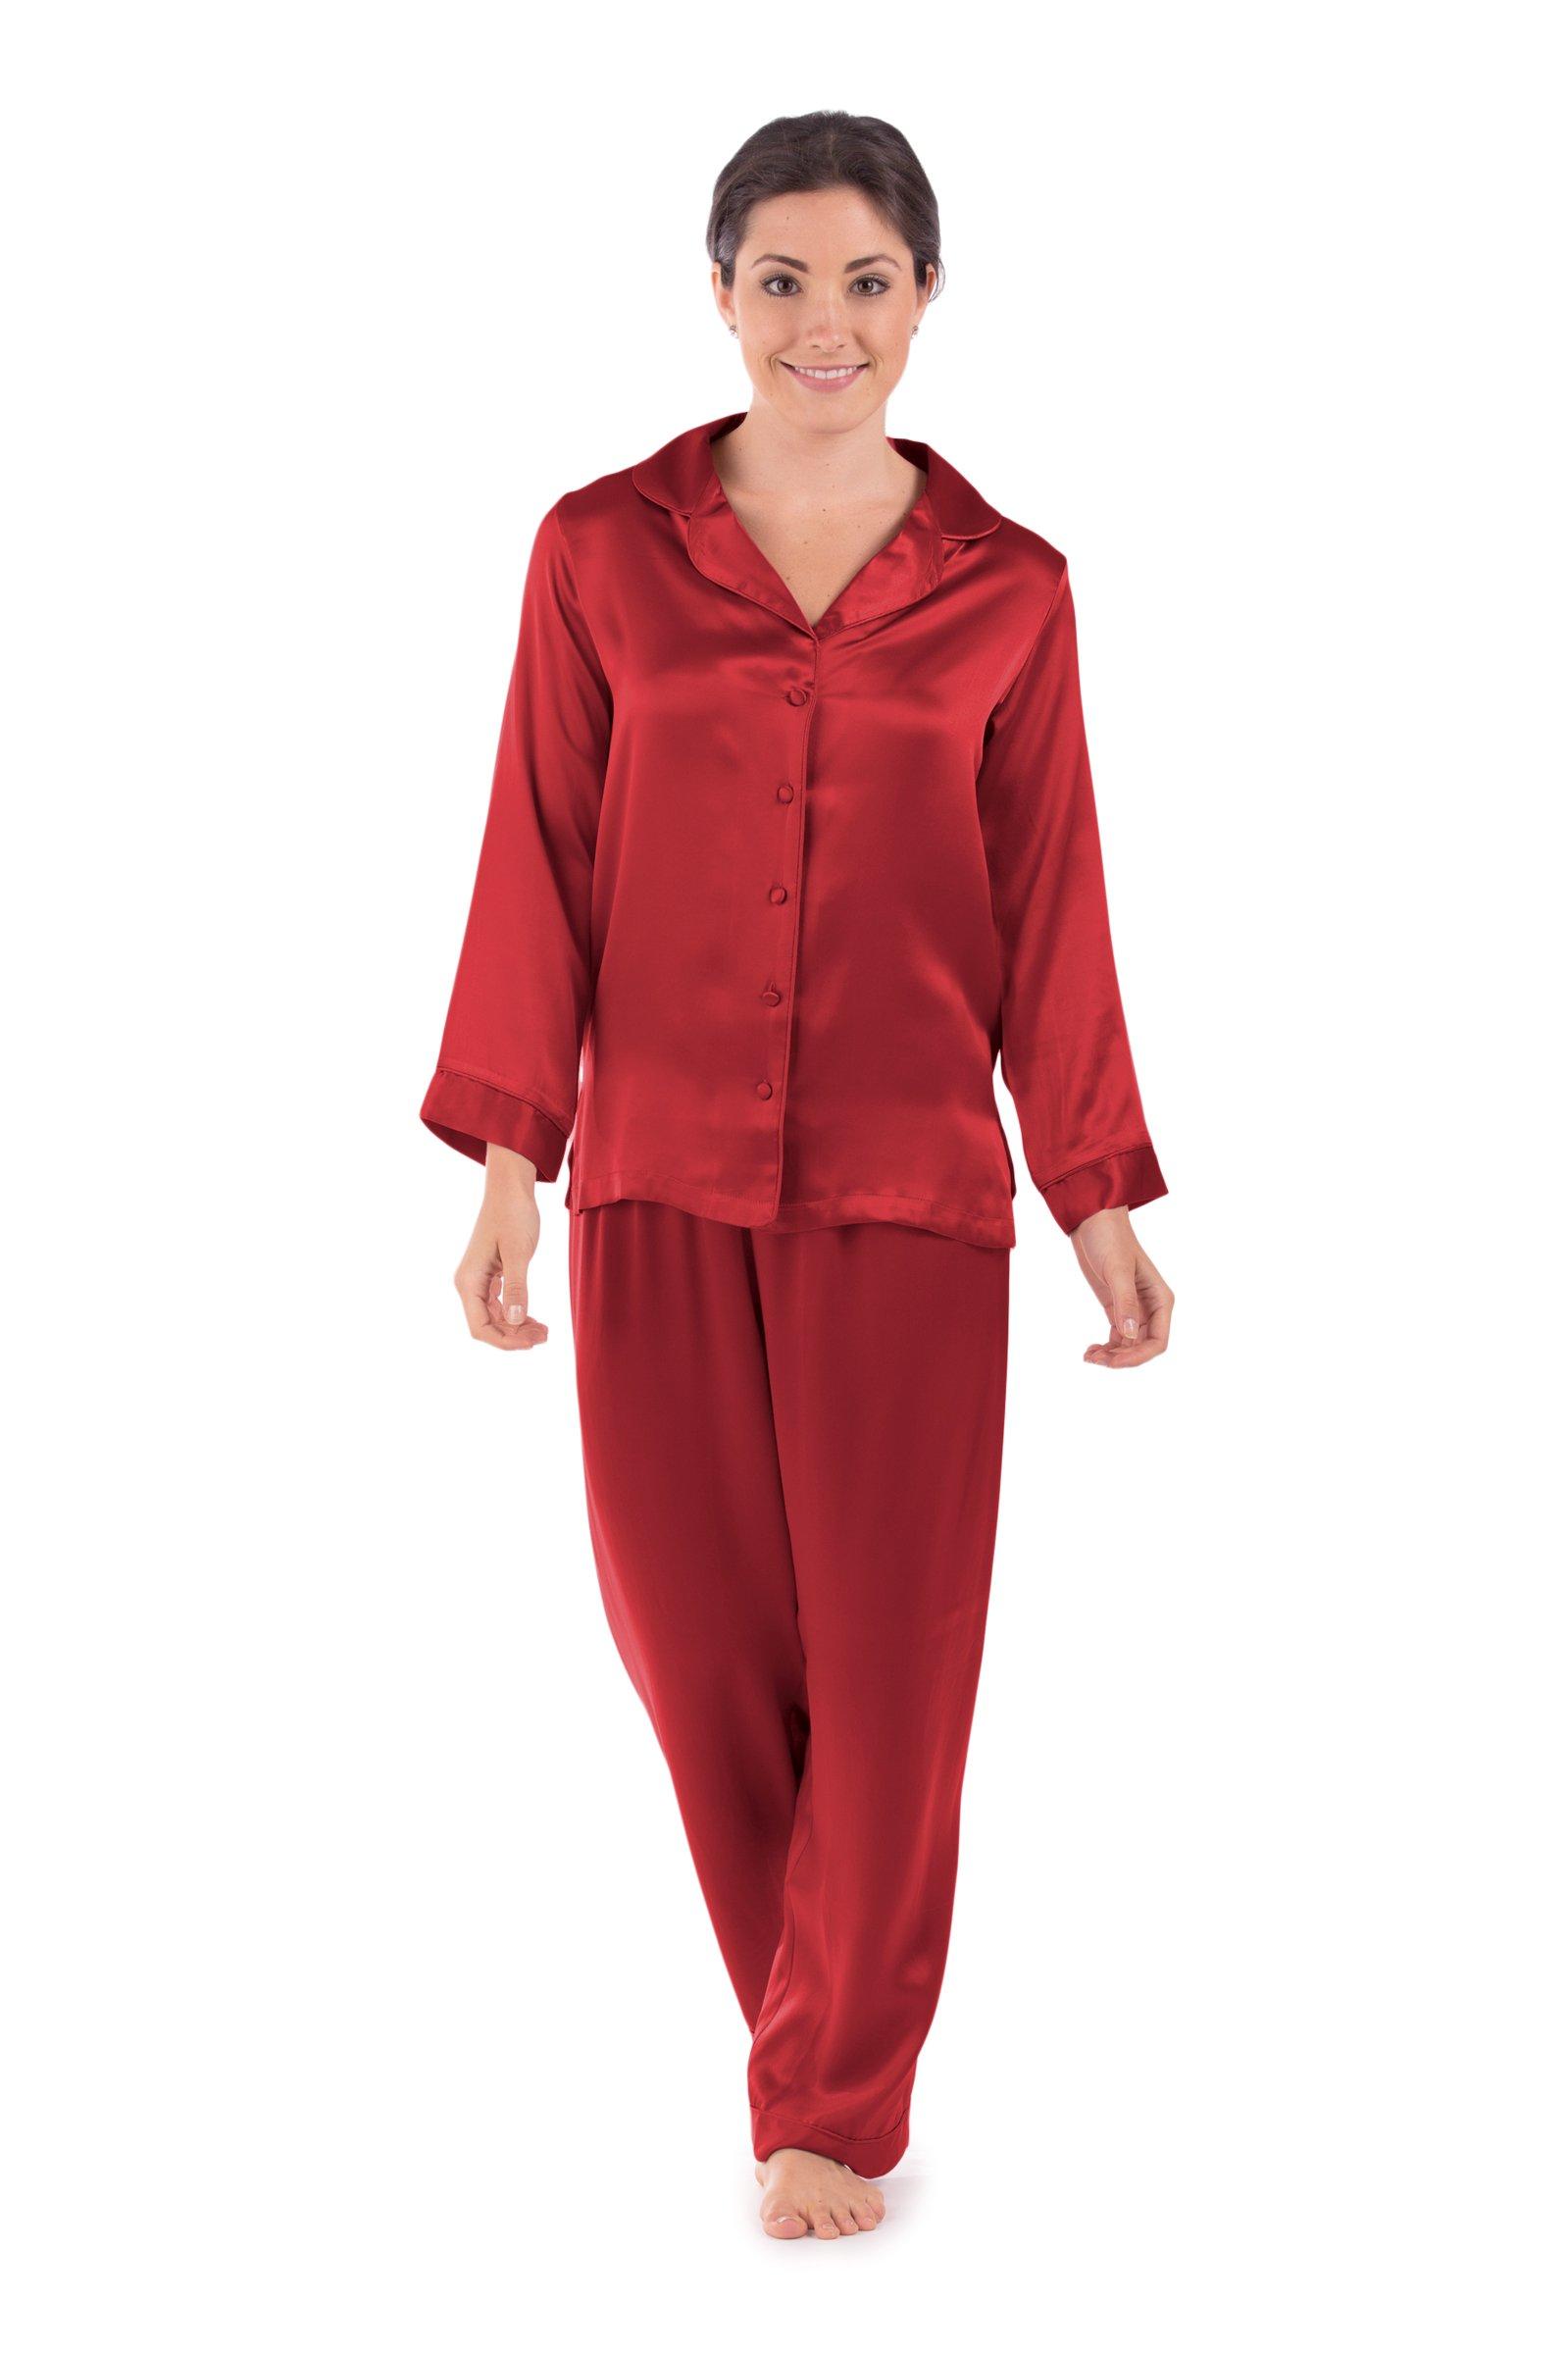 TexereSilk Women's 100% Silk Pajama Set - Luxury Sleepwear PJS by (Morning Dew, Tango Red, X-Large) Best Women's Holiday Gift WS0001-TRD-XL